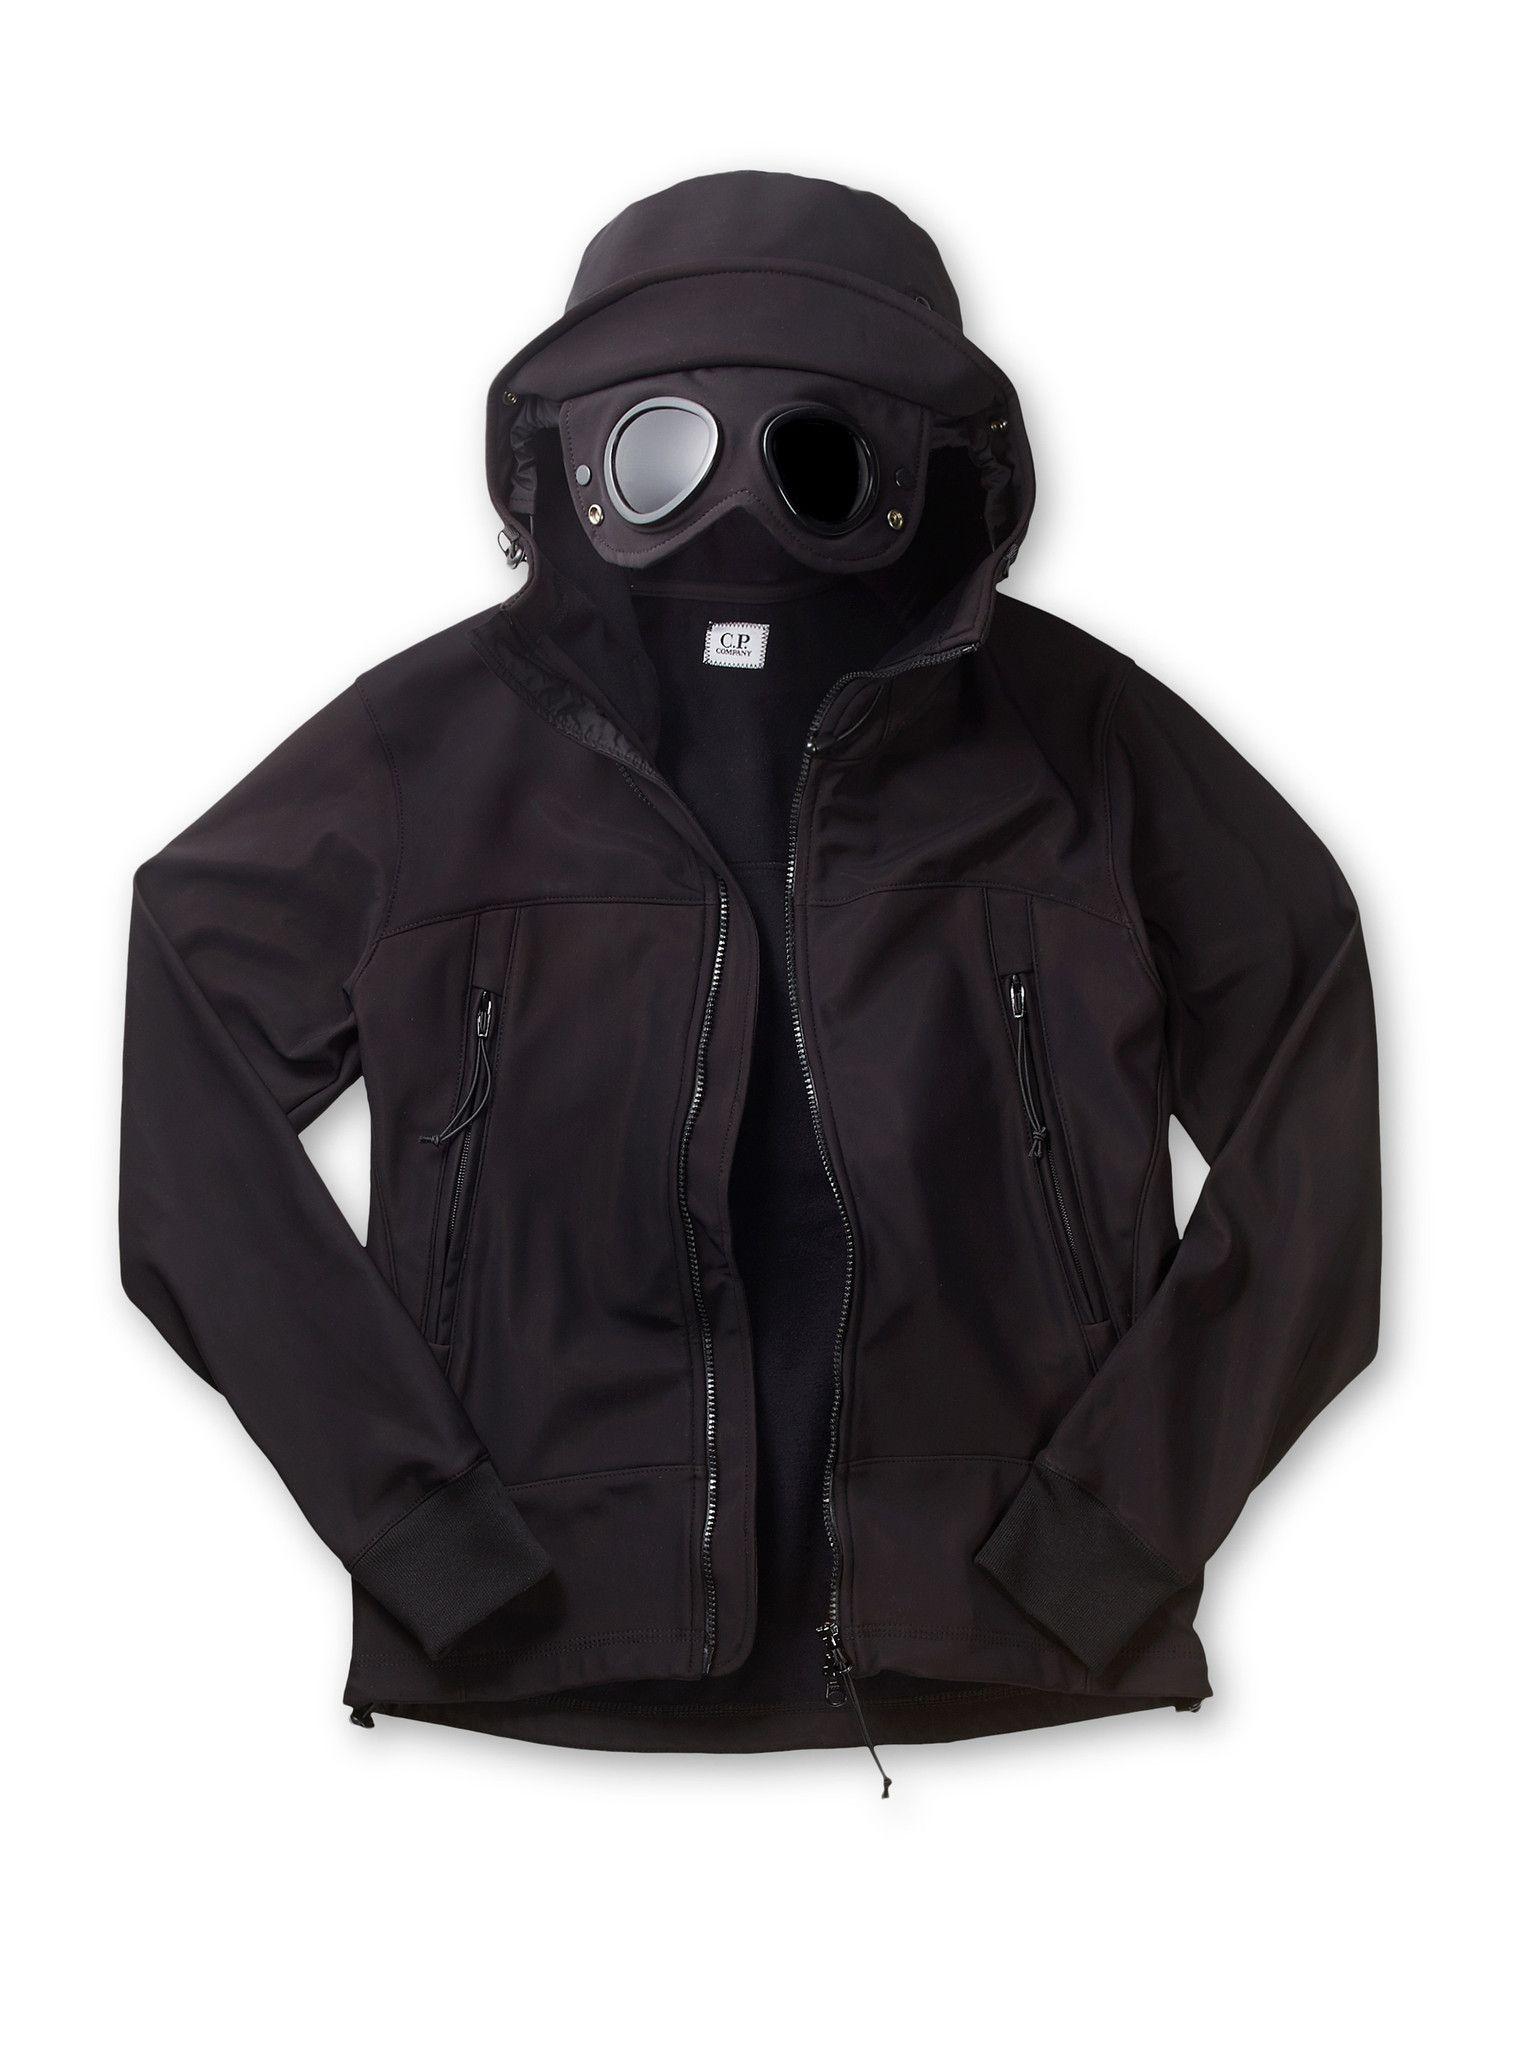 96c5961f2cec C.P. Company Soft Shell Bonded Goggle Jacket in Black | CSLS en 2019